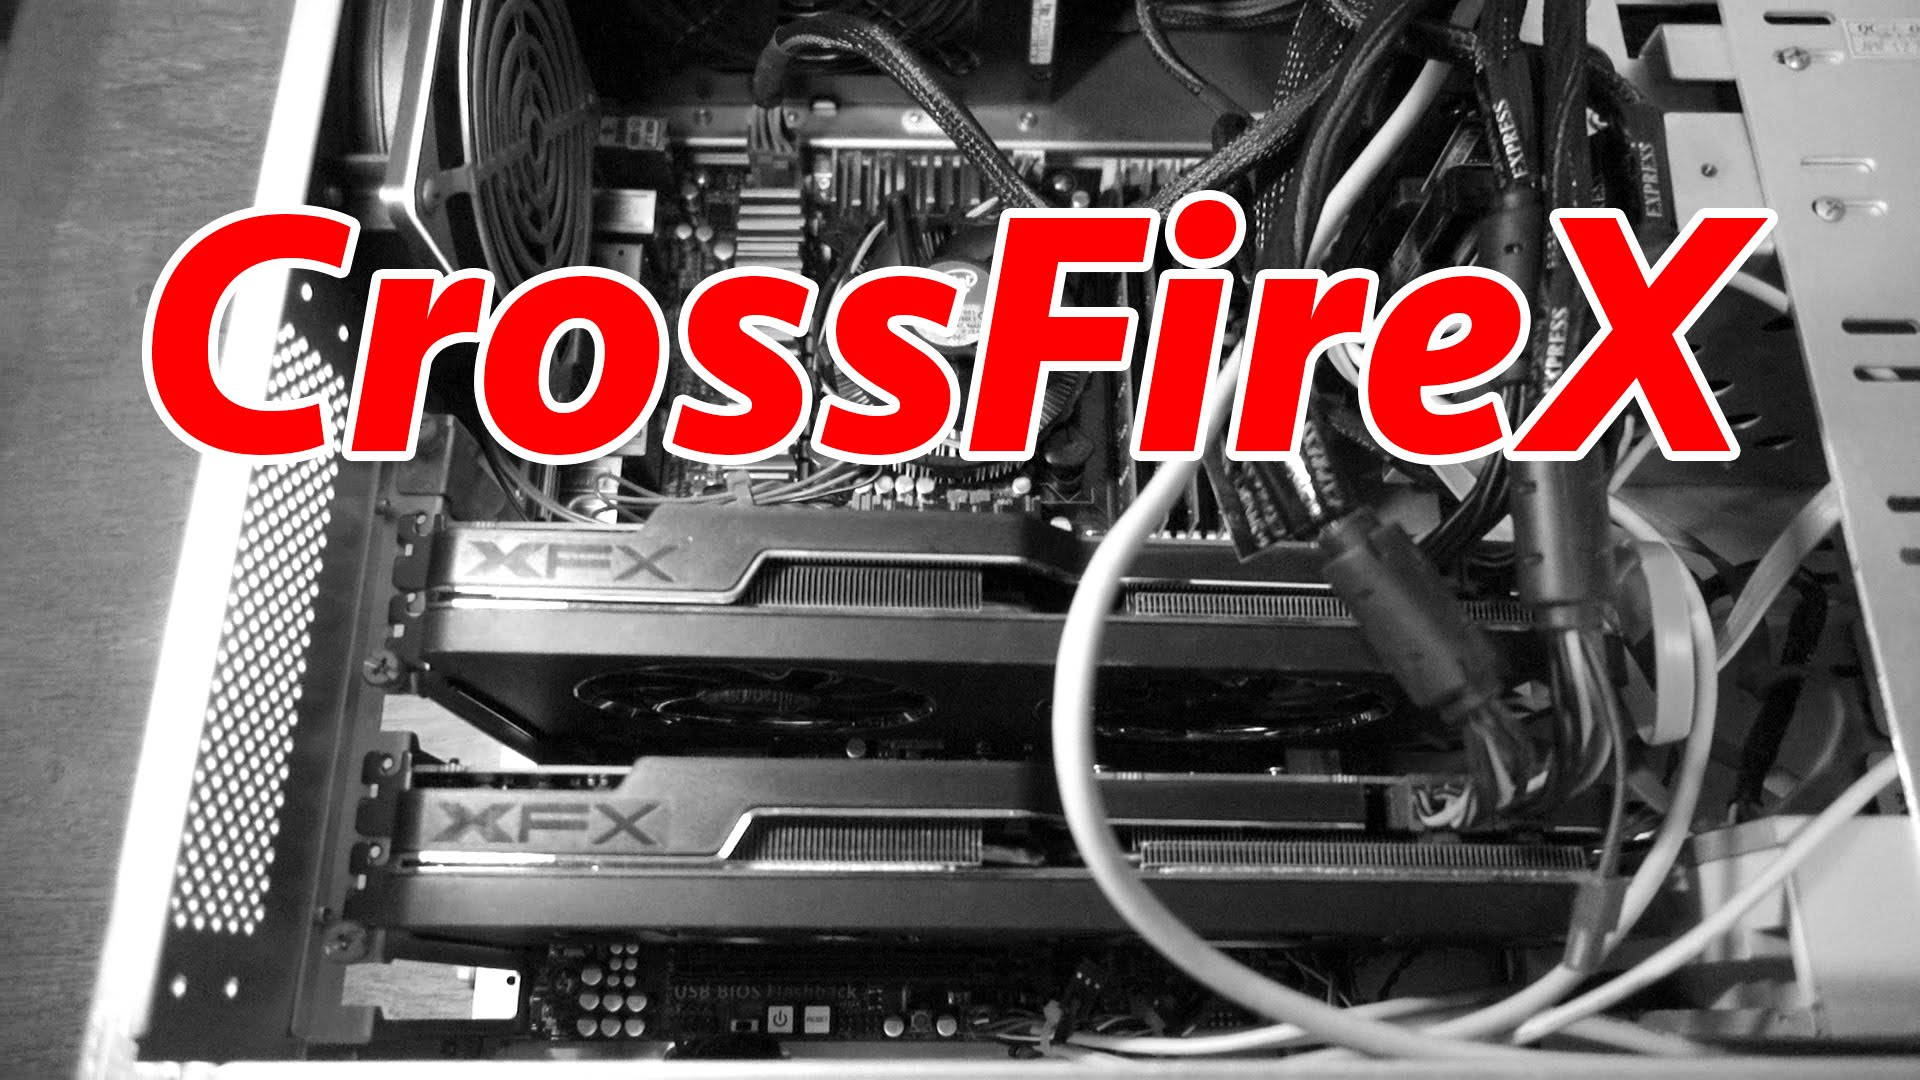 Radeon R9 290 CrossFireX